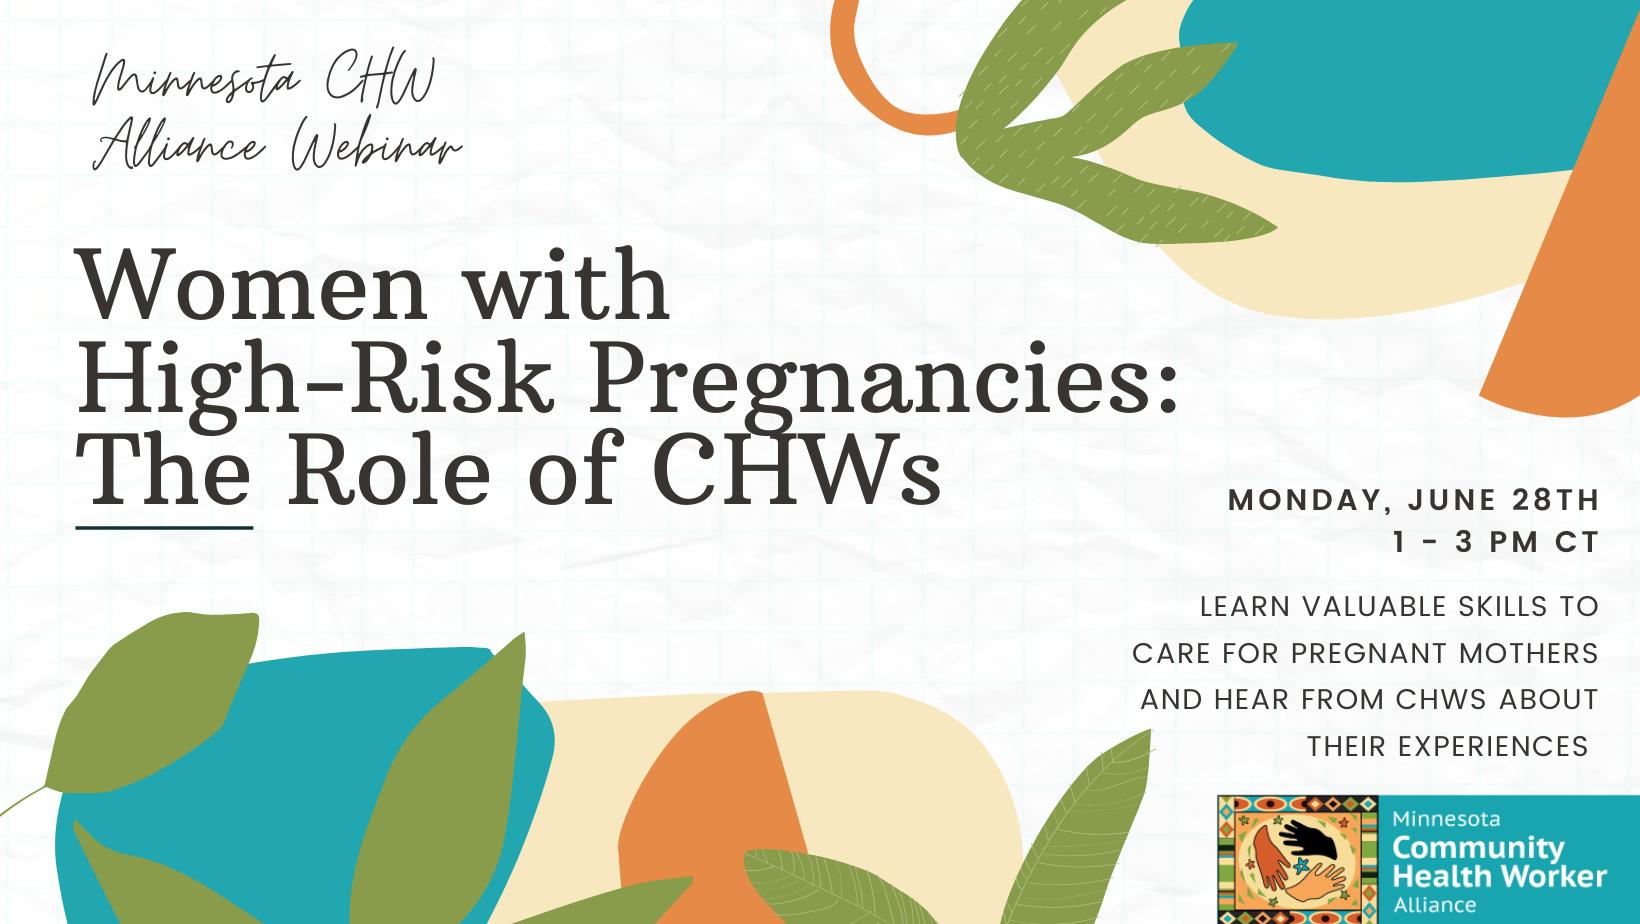 June 28th DHS Webinar on High Risk Pregnancies